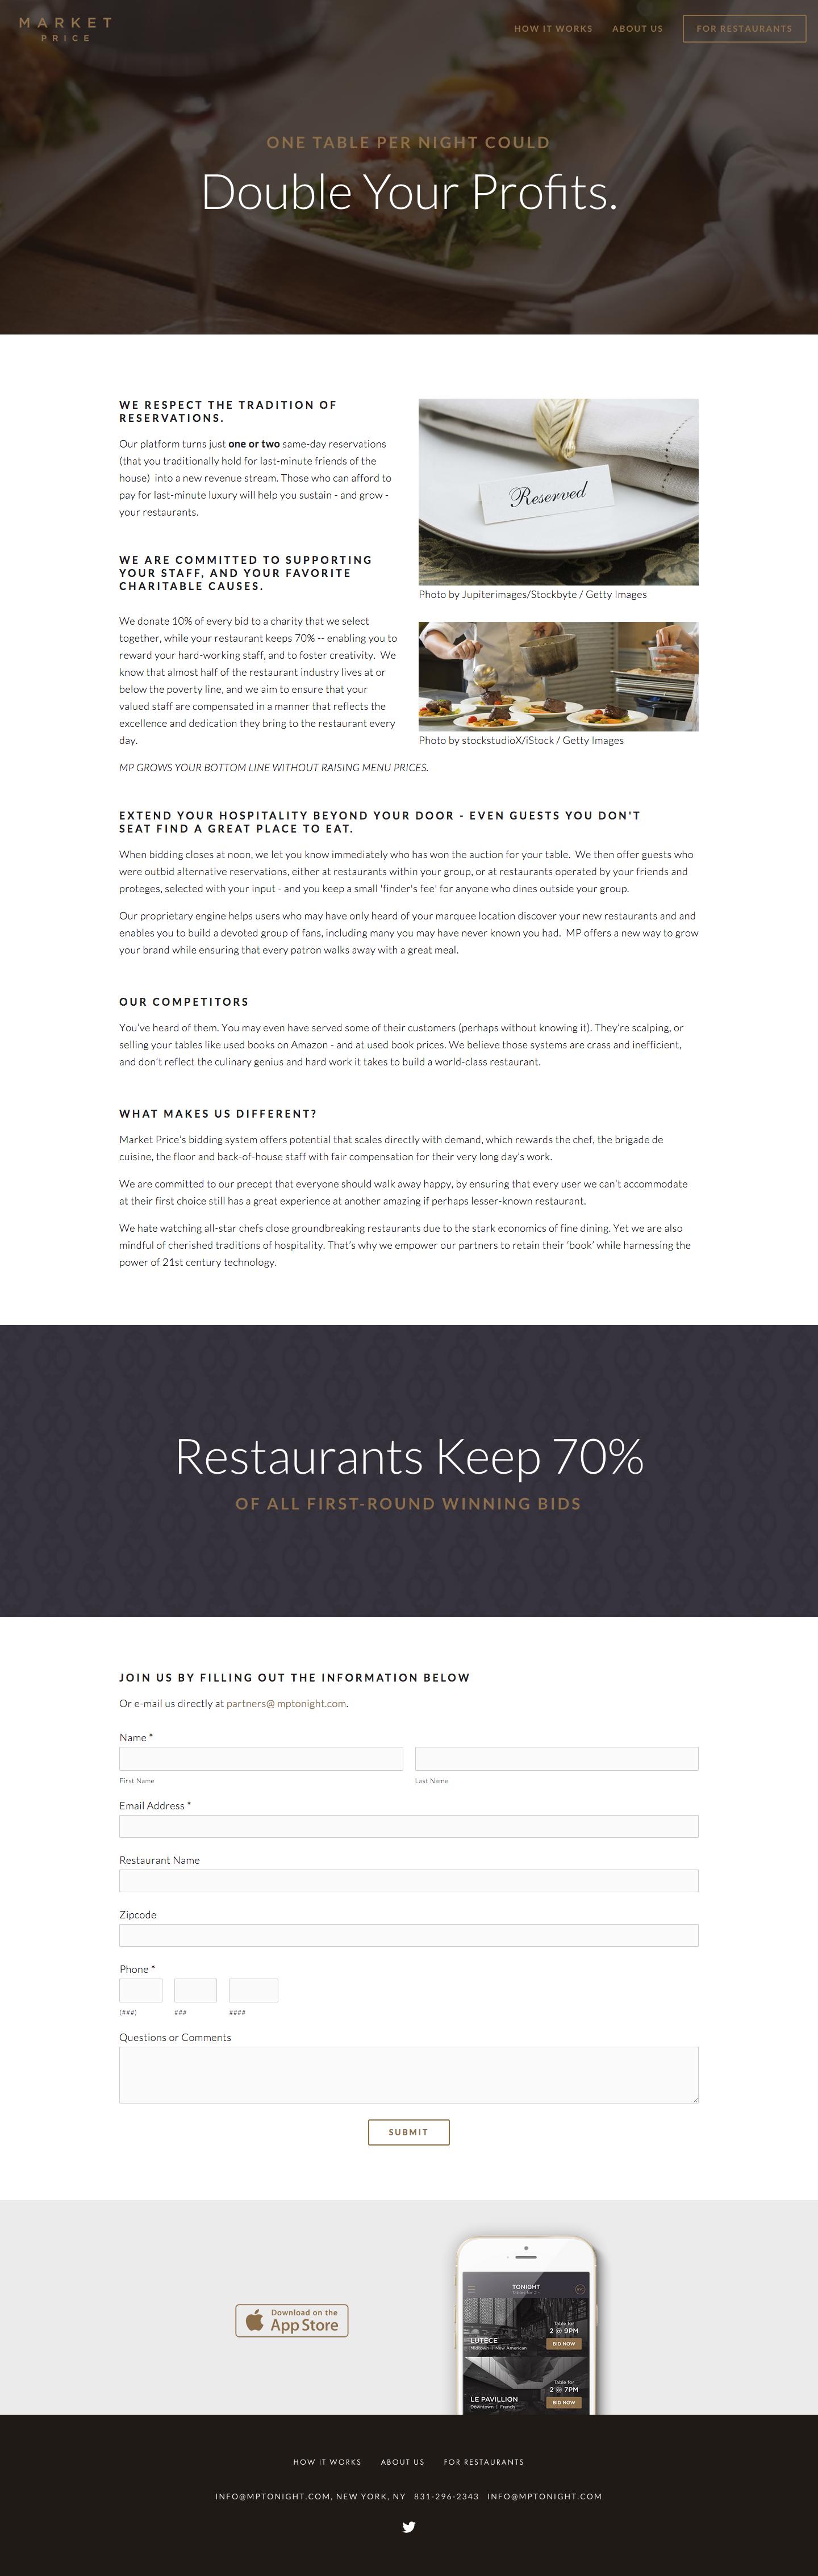 "Promotional website ""For Restaurants"""